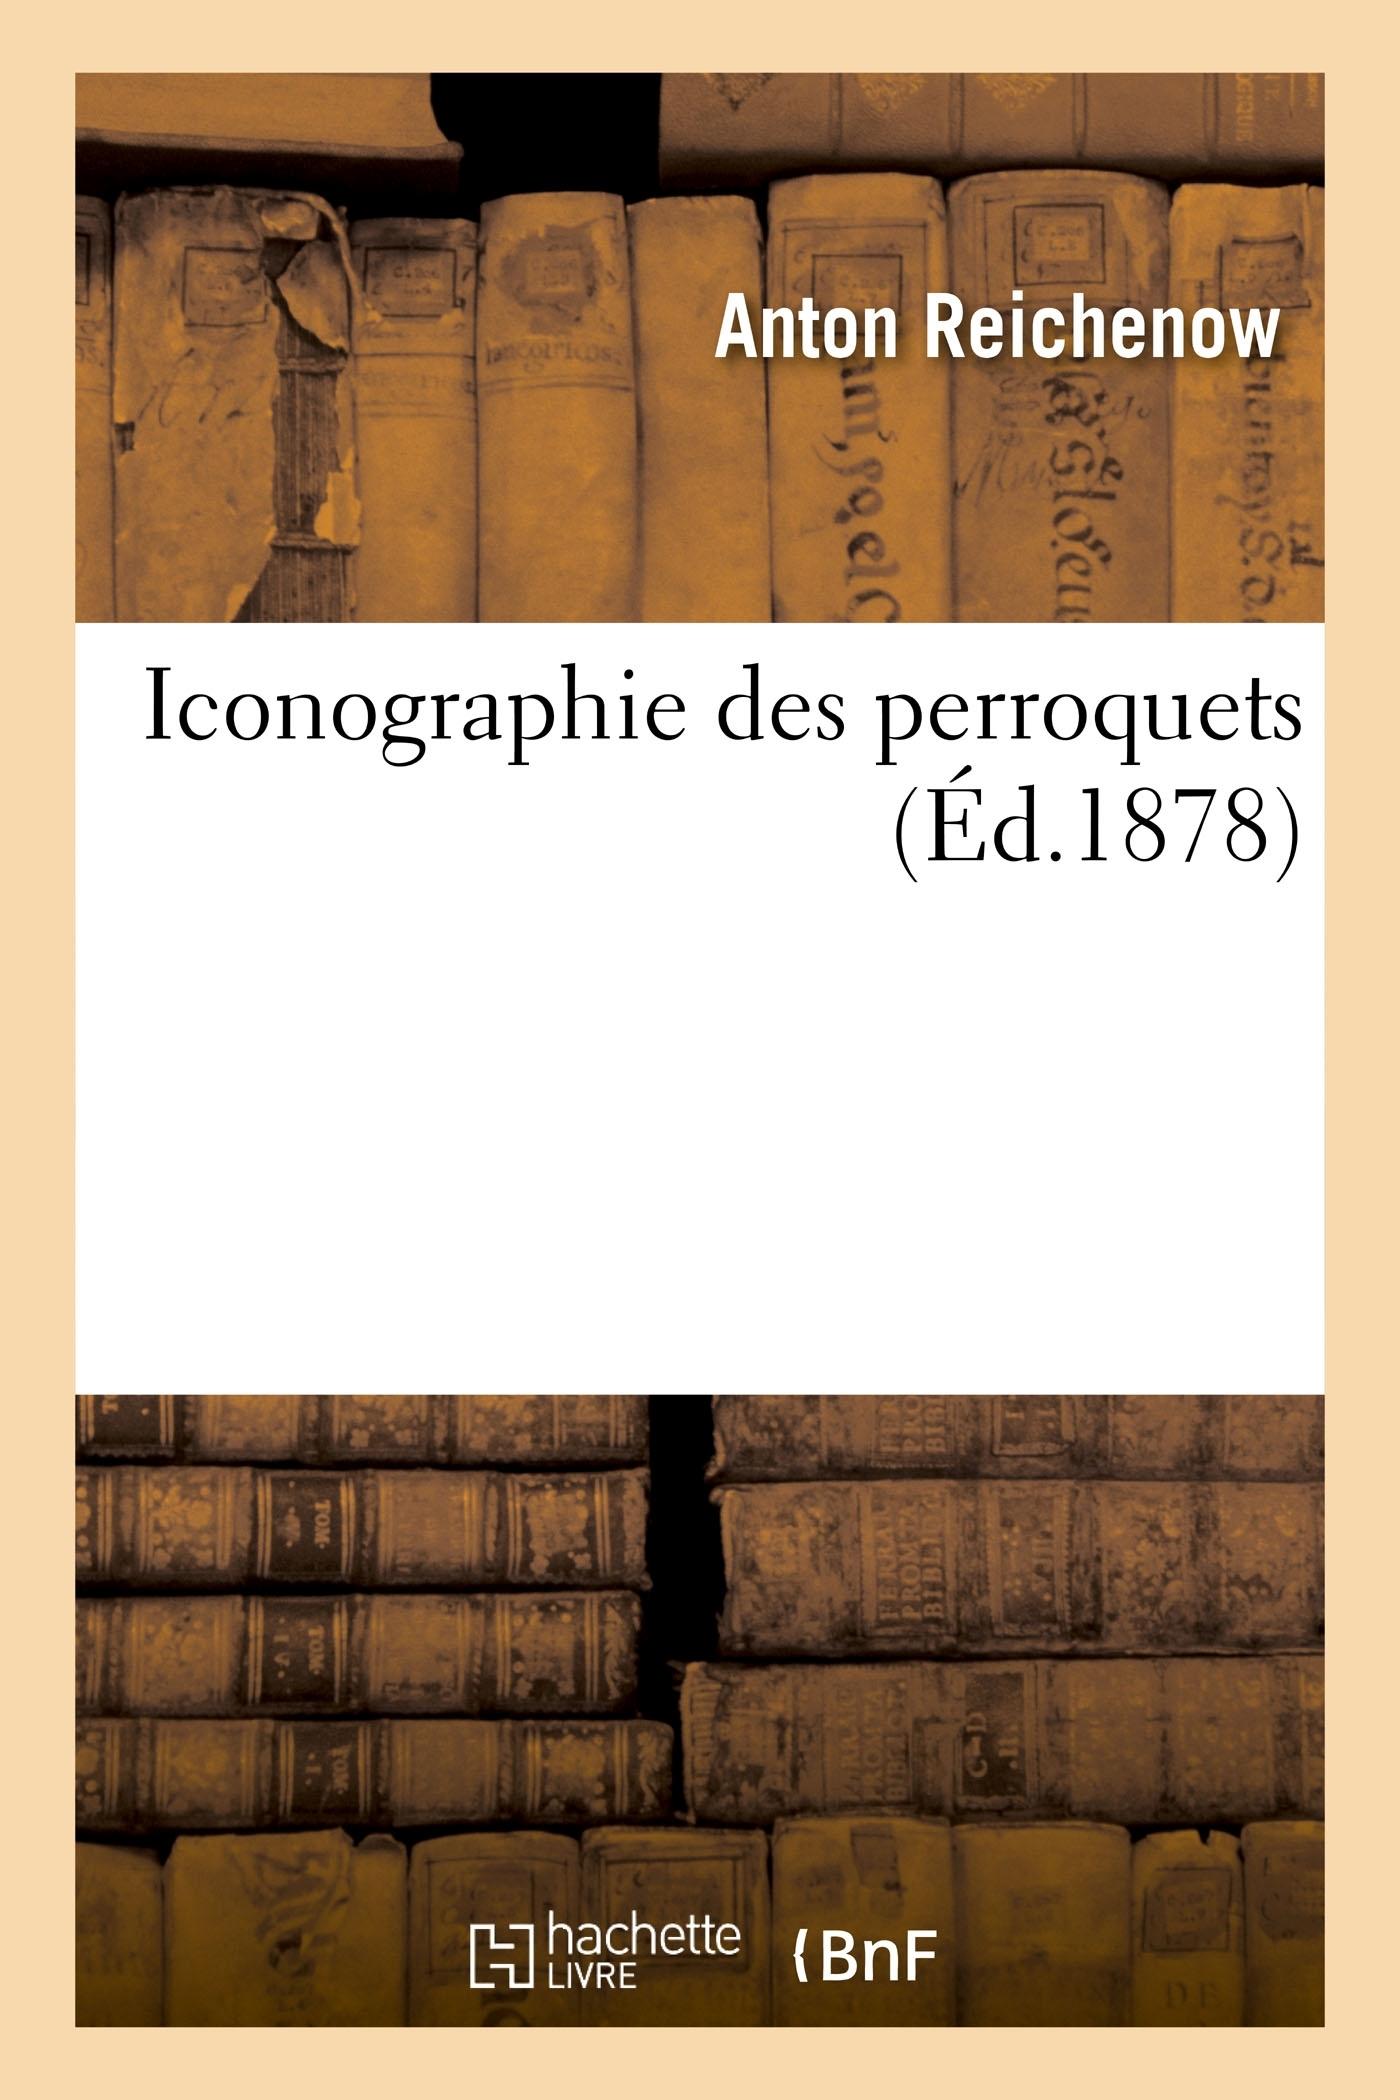 ICONOGRAPHIE DES PERROQUETS